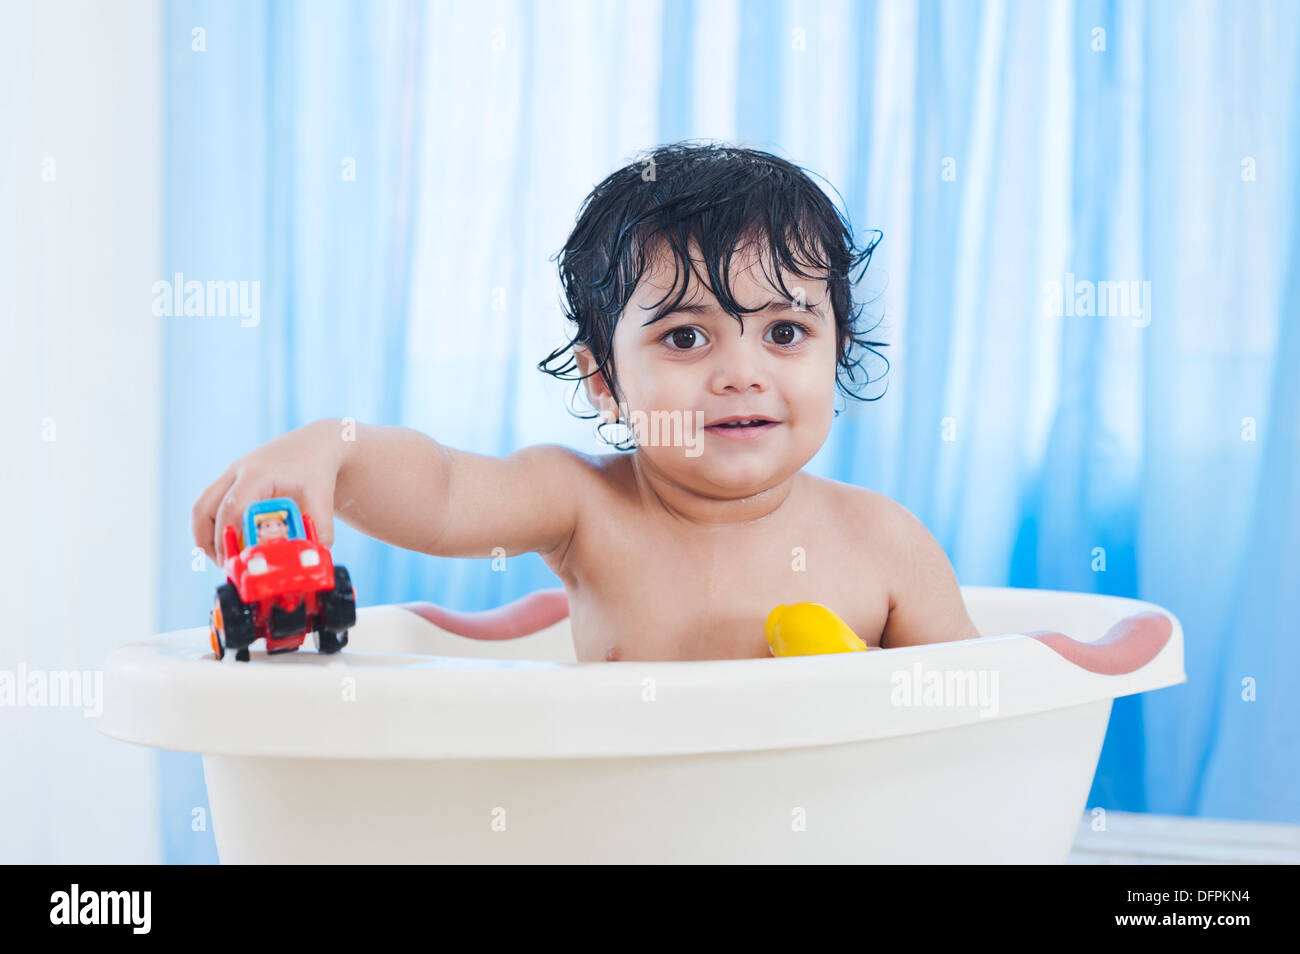 Asian Baby Boy Bathing Stock Photos & Asian Baby Boy Bathing Stock ...